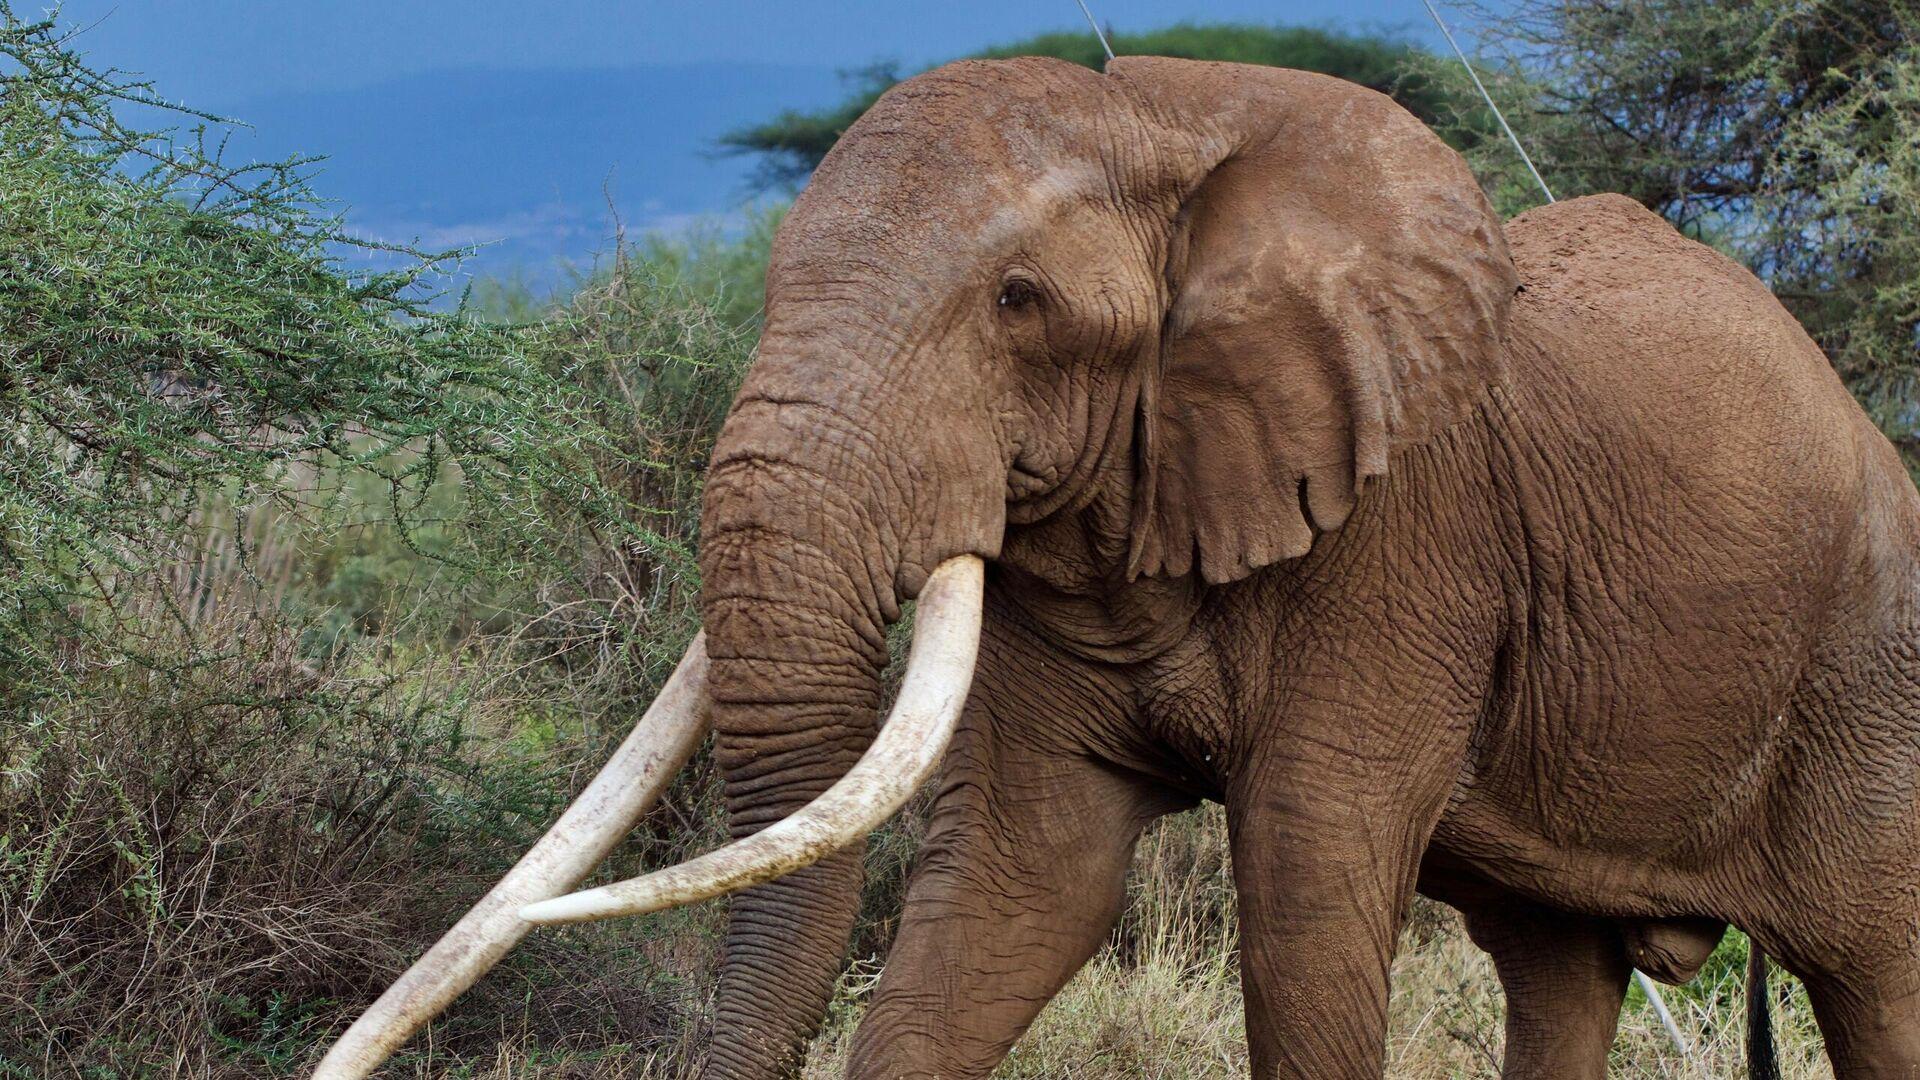 1564297077 0:304:2560:1744 1920x0 80 0 0 1d81cd67b0501a5939ebb924c49be190 - В ЮАР слон заблокировал автодорогу в заповеднике